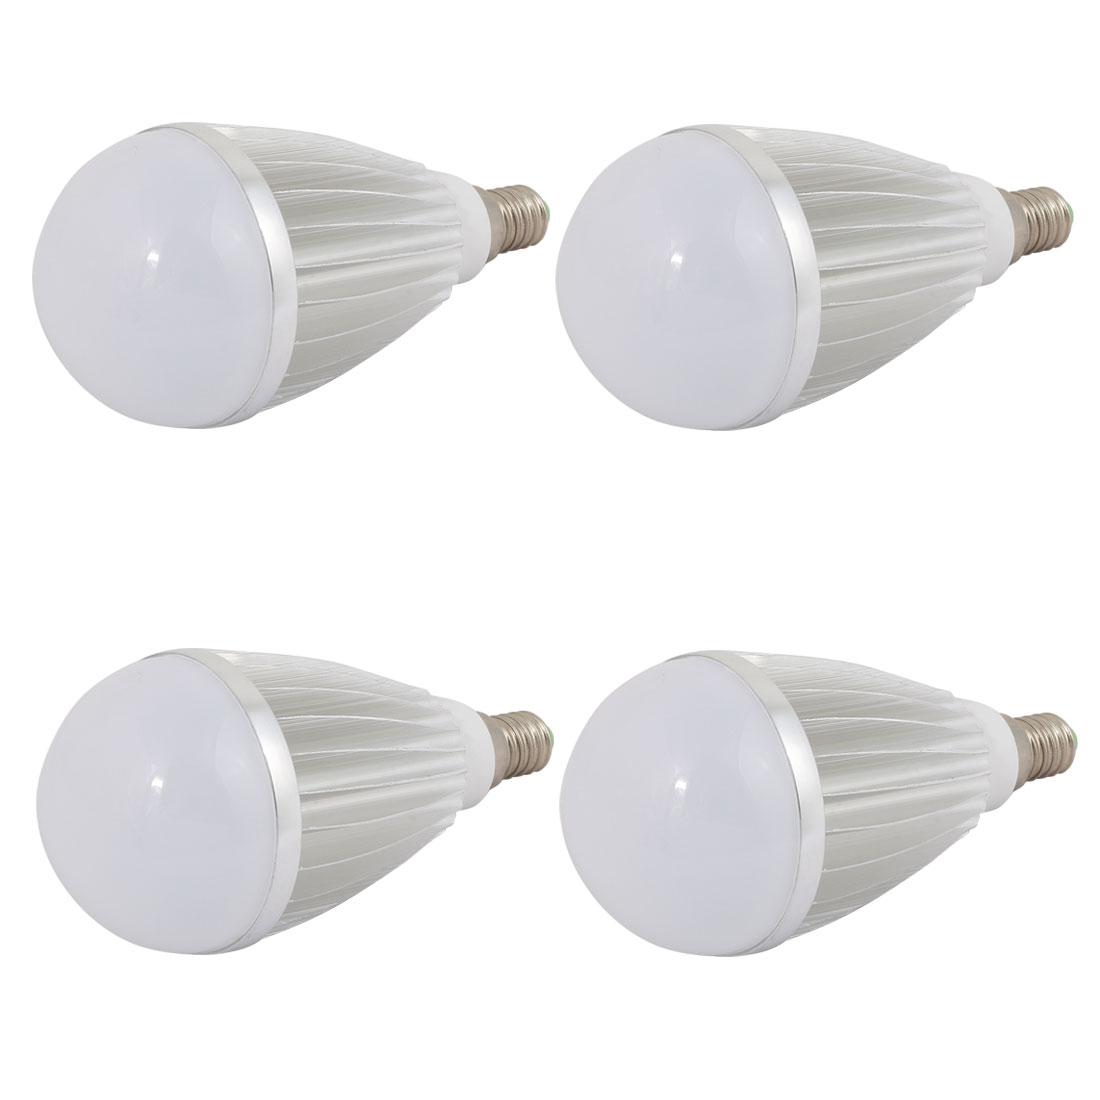 4 Pcs 7W Slivery Aluminum Ball - Bulb Lamp Housing E14 Screw Base w White Cover